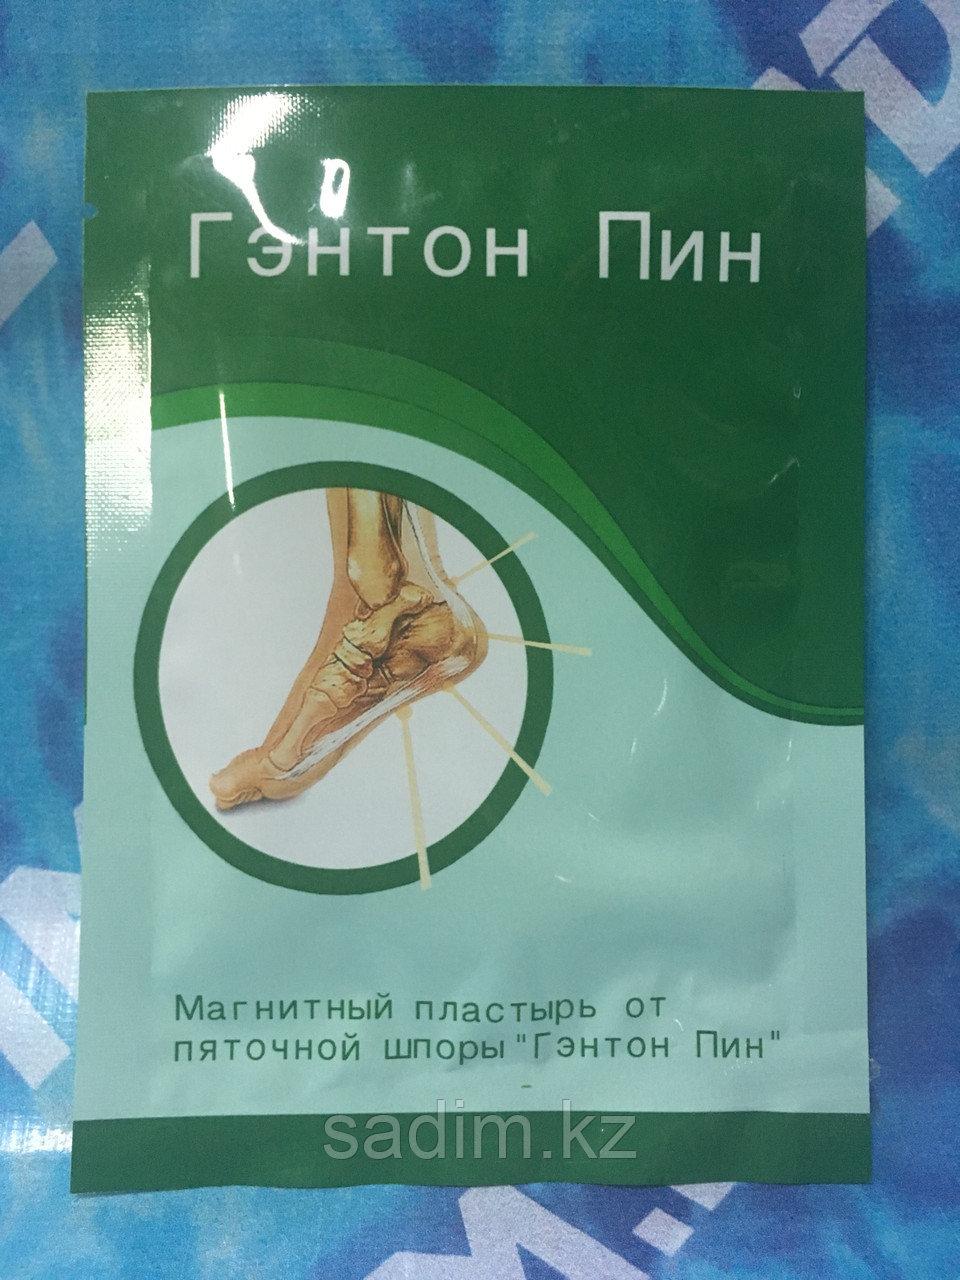 Магнитный пластырь от шпор  Гэнтон Пин (4 шт)